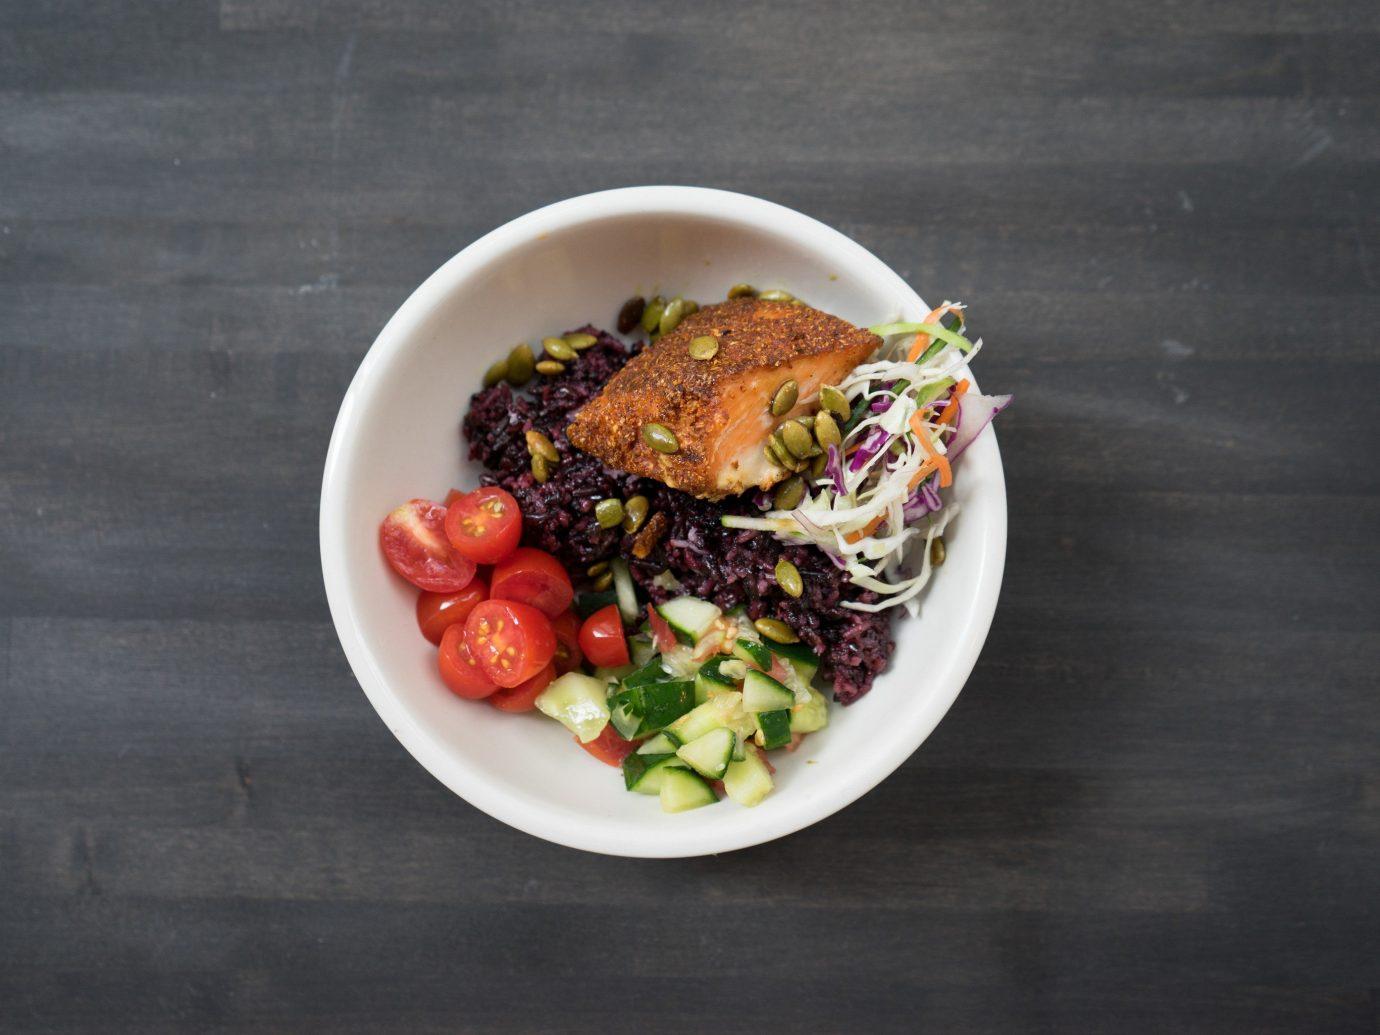 Food + Drink food table plate dish vegetable bowl meal produce plant breakfast fruit cuisine salad flowering plant meat